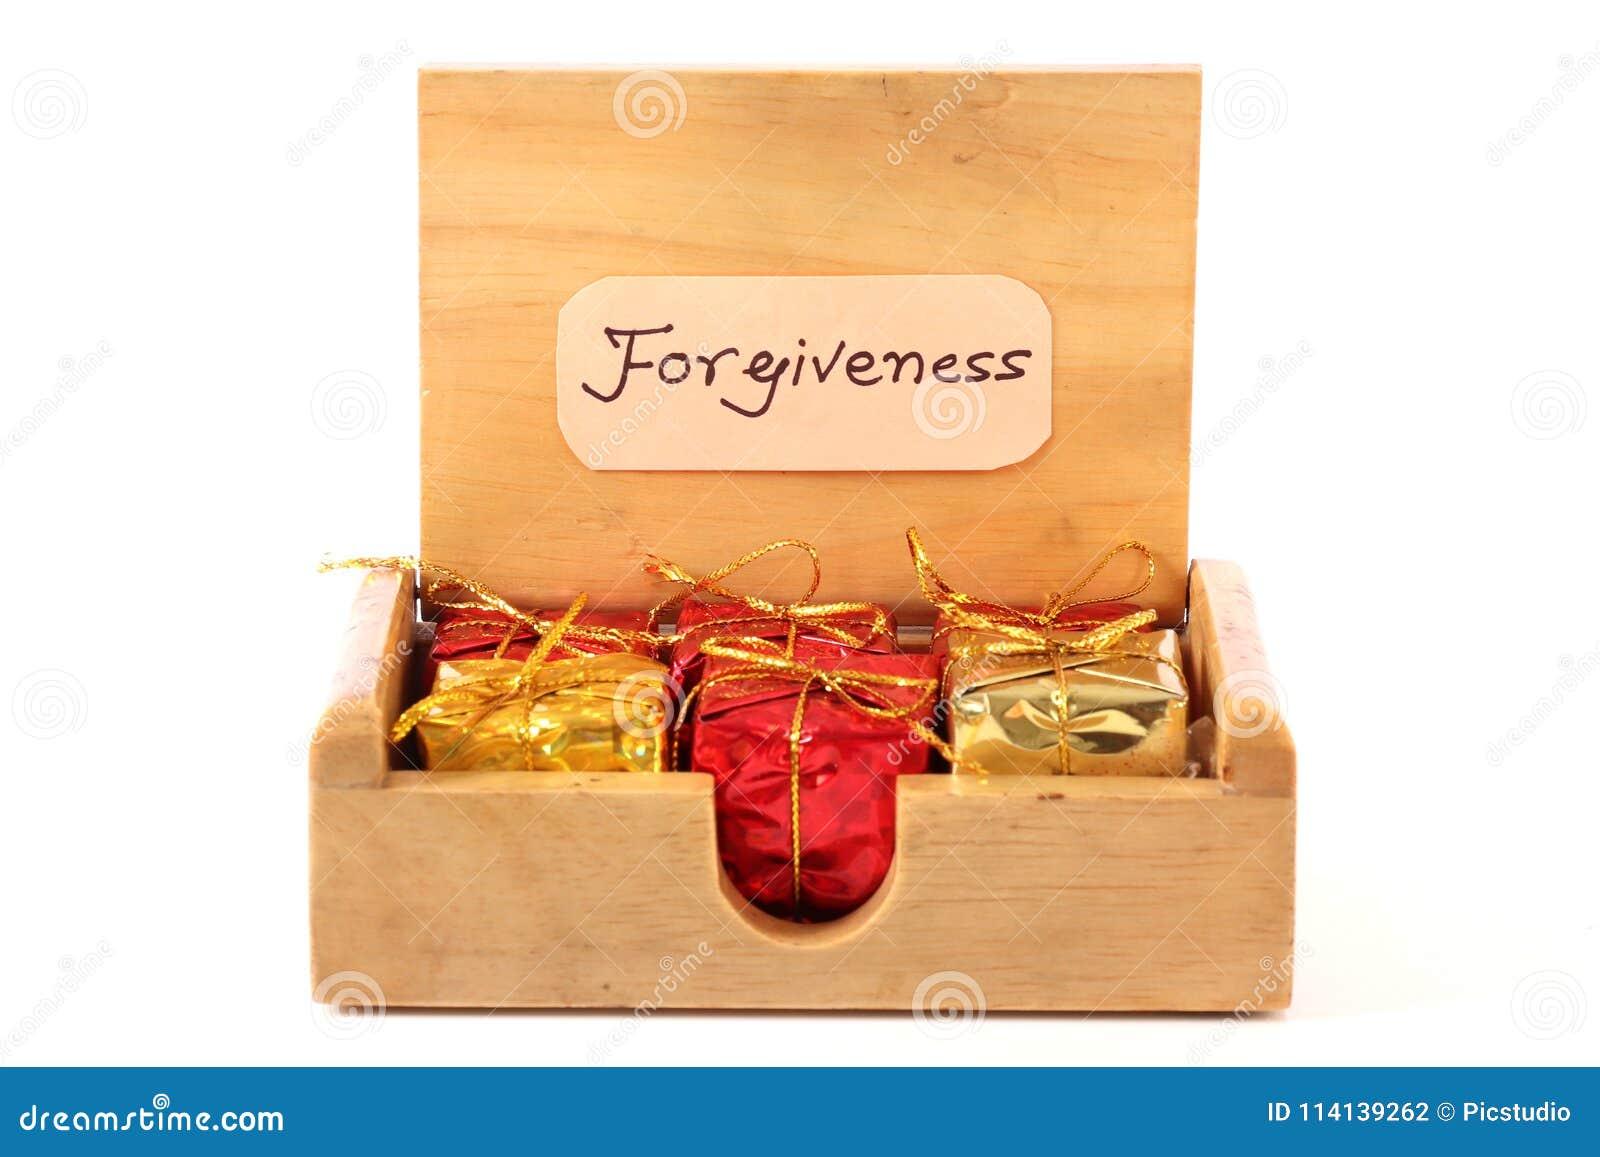 Forgiveness gifts